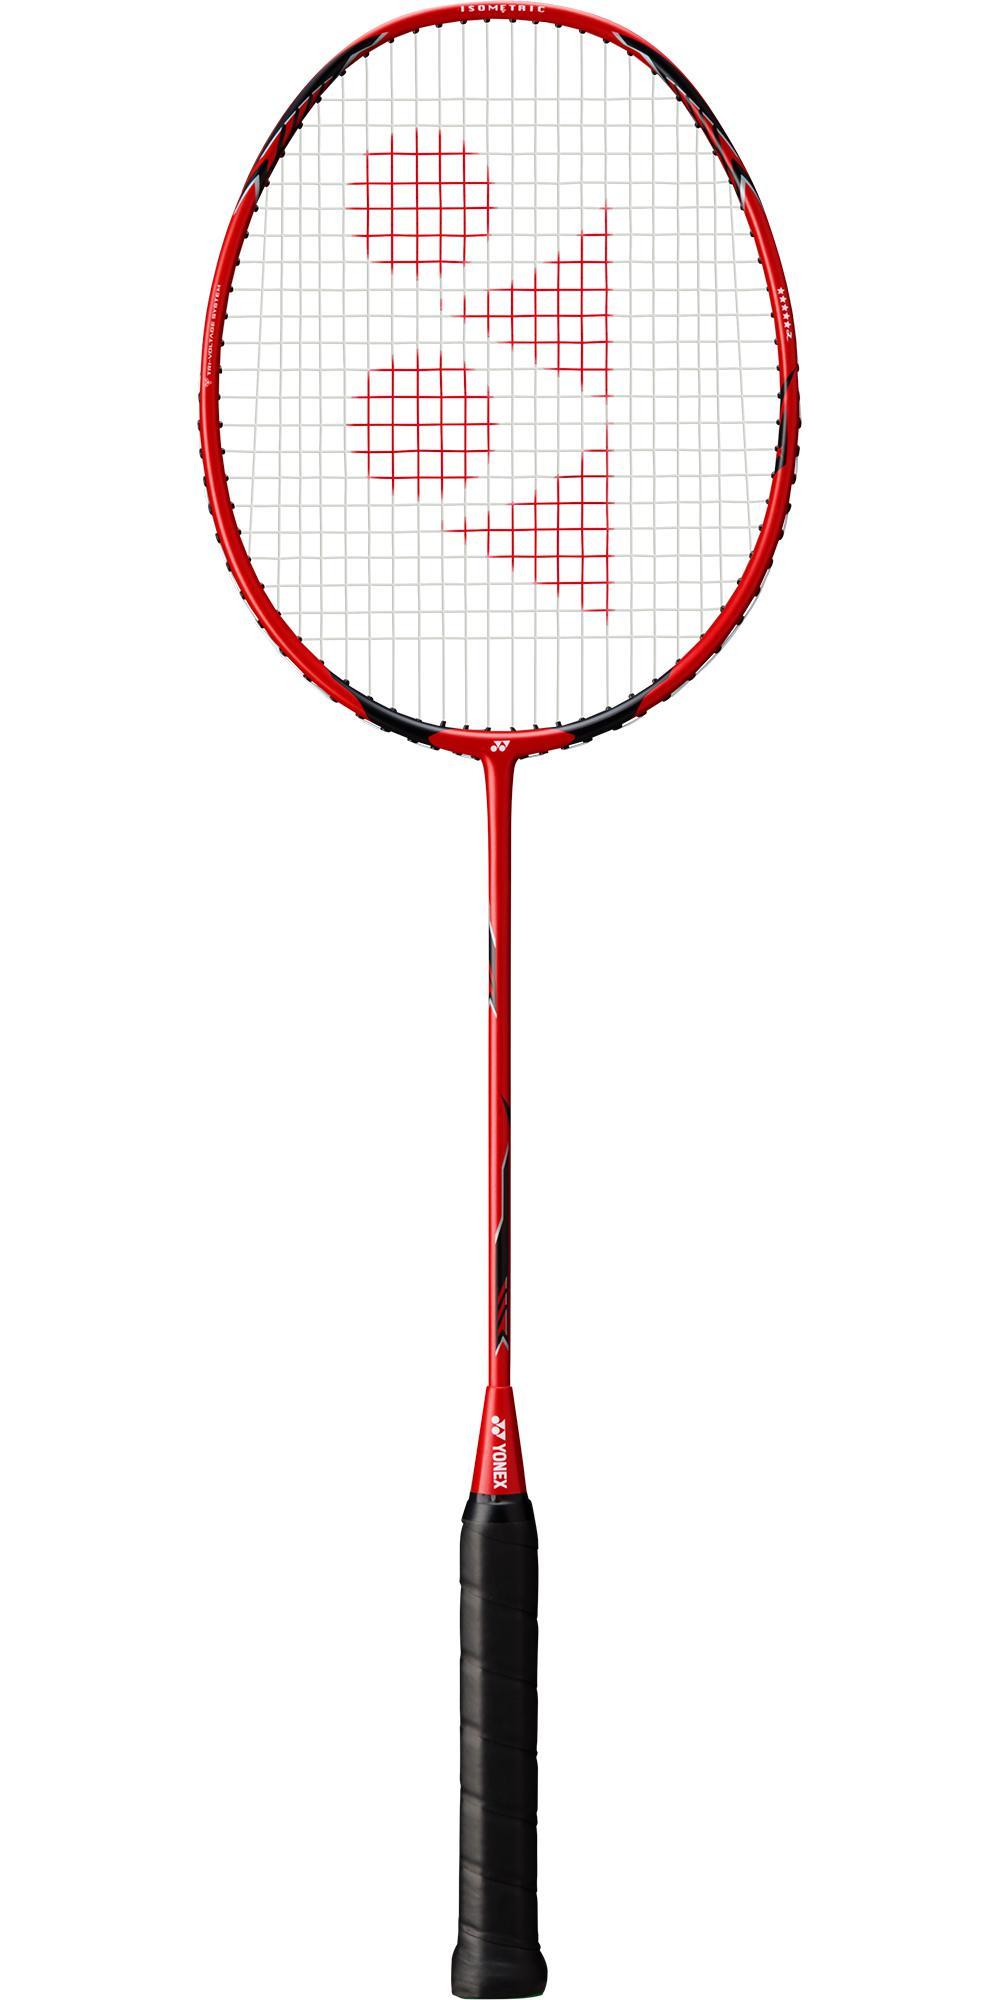 Yonex Voltric 100 Lin Dan Badminton Racket - Red ...